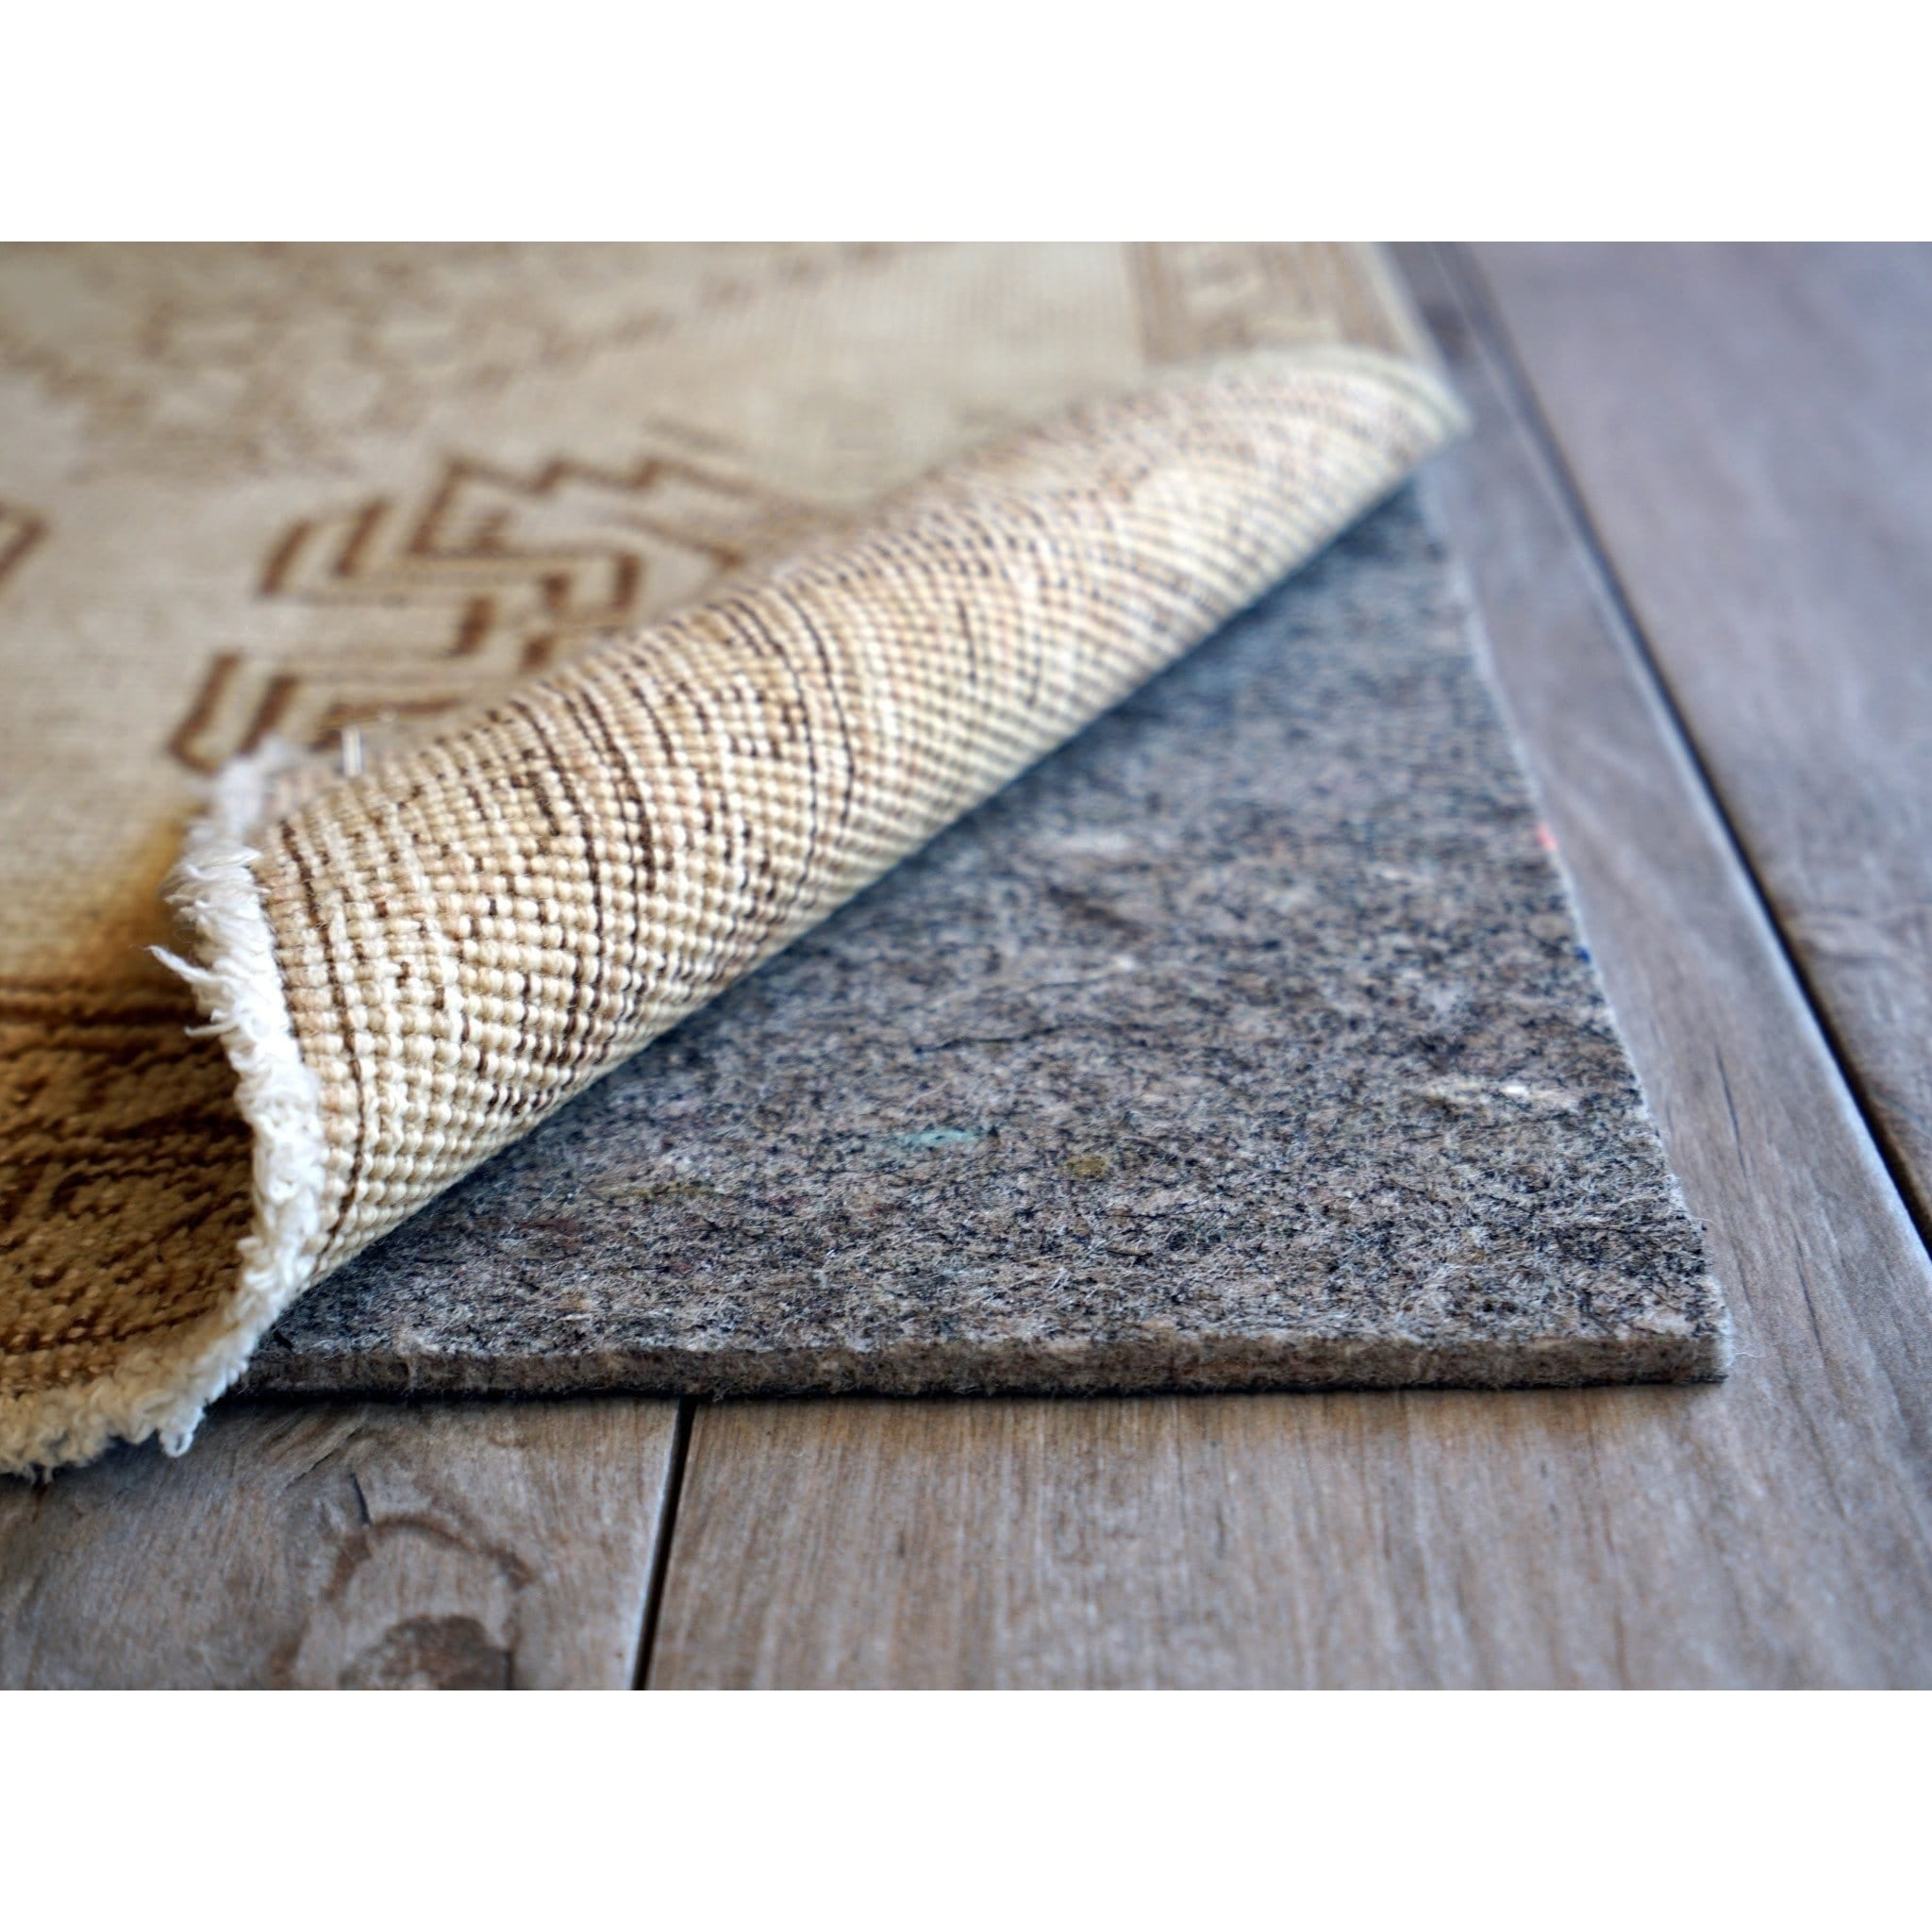 lowes pads flooring rug mat furry white for hardwood rugs floors pad non your cozy slip nice felt grip